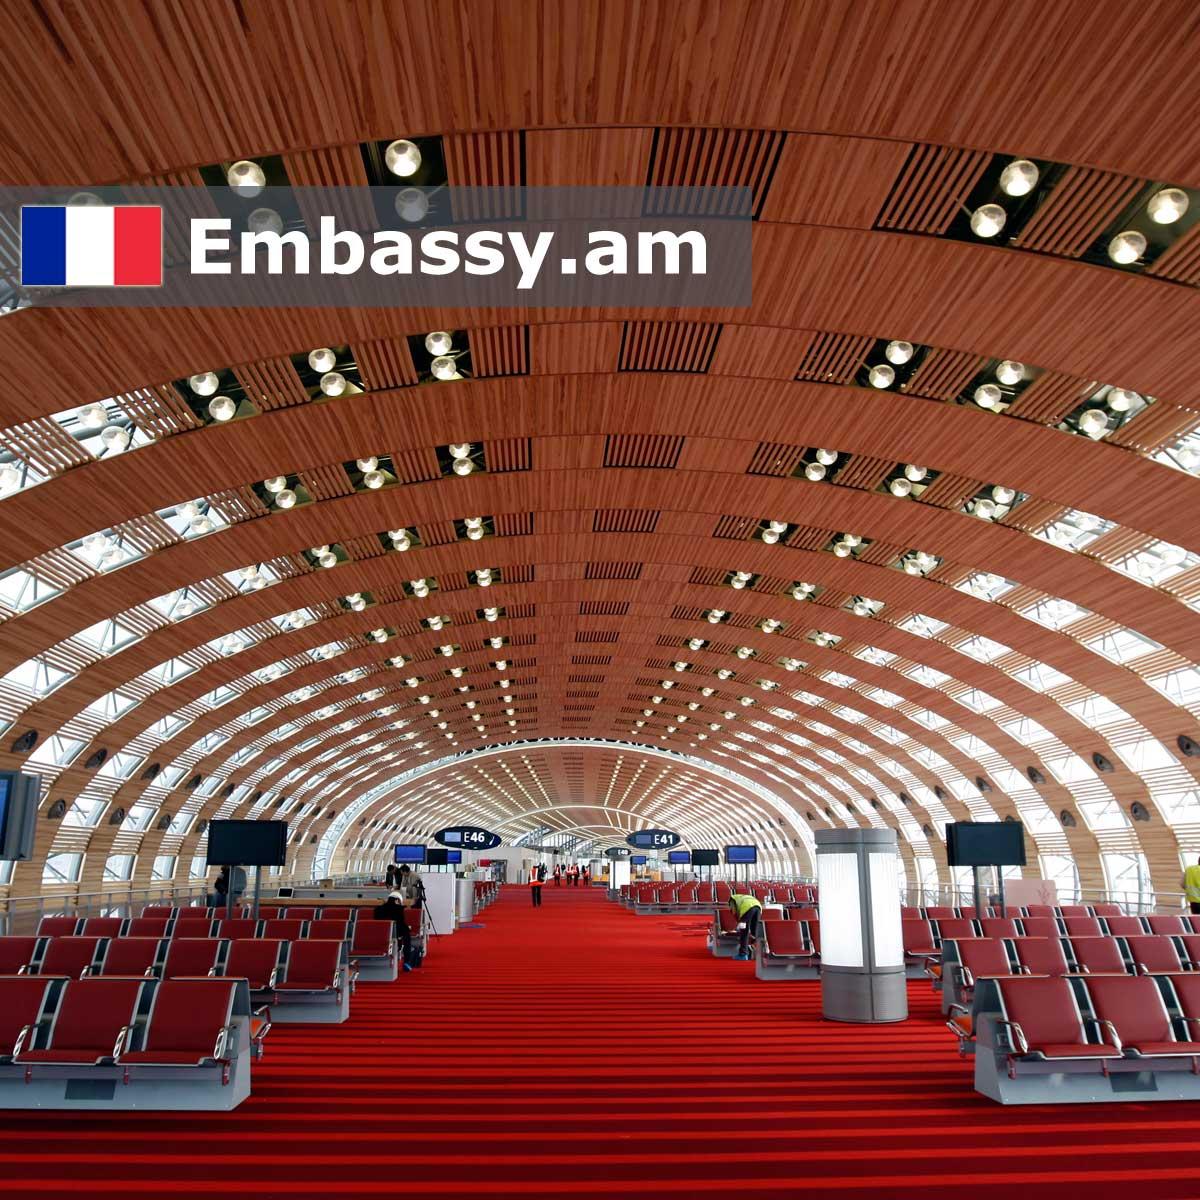 Руасси-ан-Франс - Отели во Франции - Embassy.am